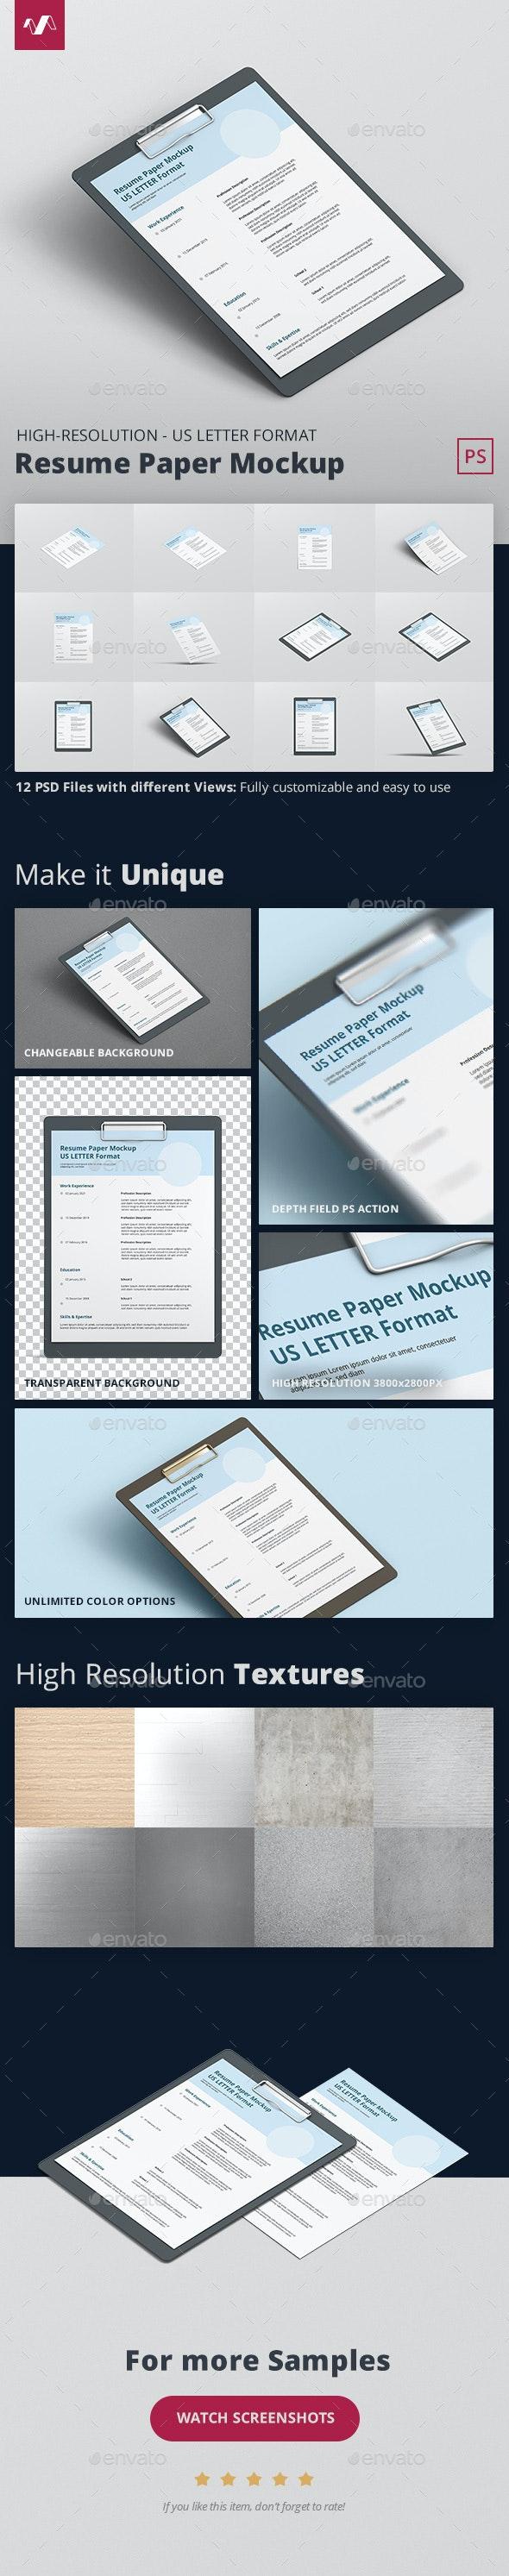 Resume Paper Mockup US Letter - Stationery Print